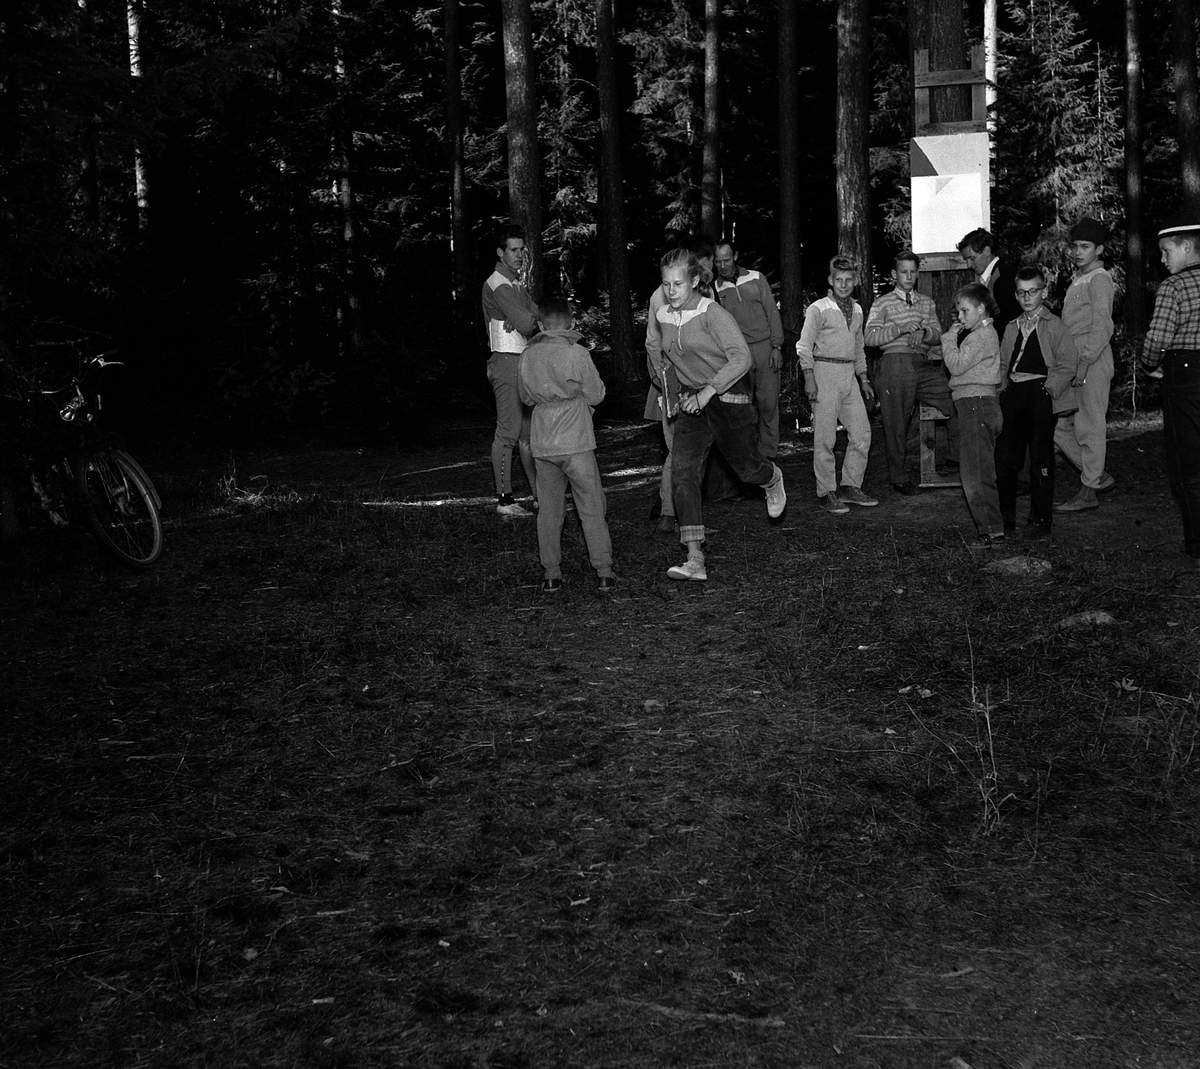 HAMAR JERNSTØPERI OG MEK. VERKSTED, HAM-JERN, ORIENTERINGSLØPERE, 1955